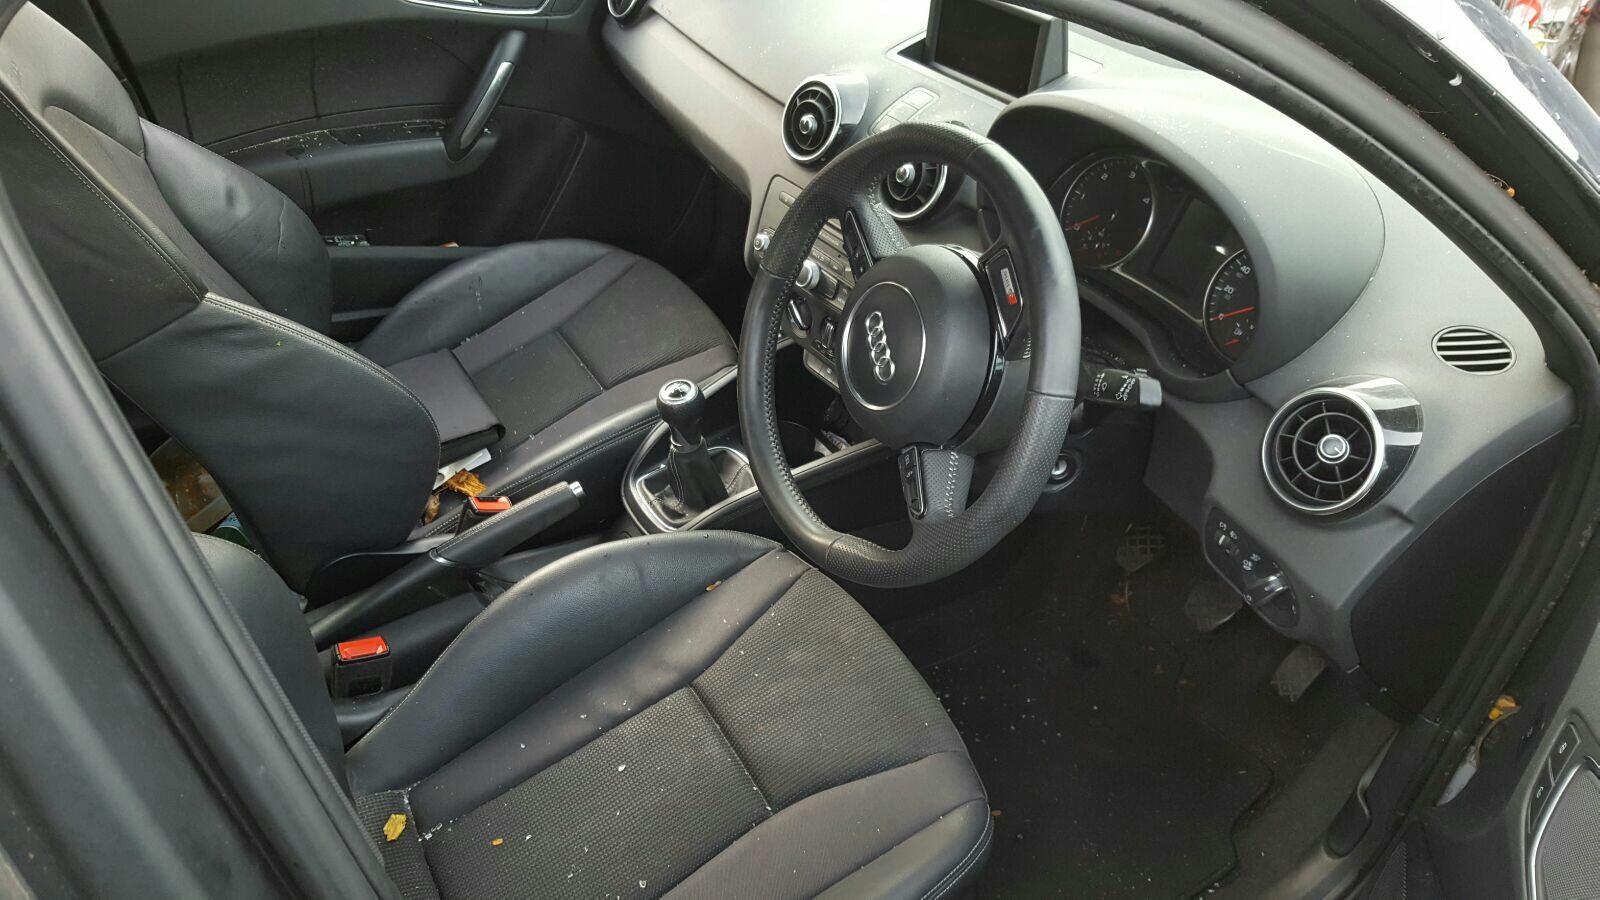 View Auto part LR Window Regulator Audi A1 2013